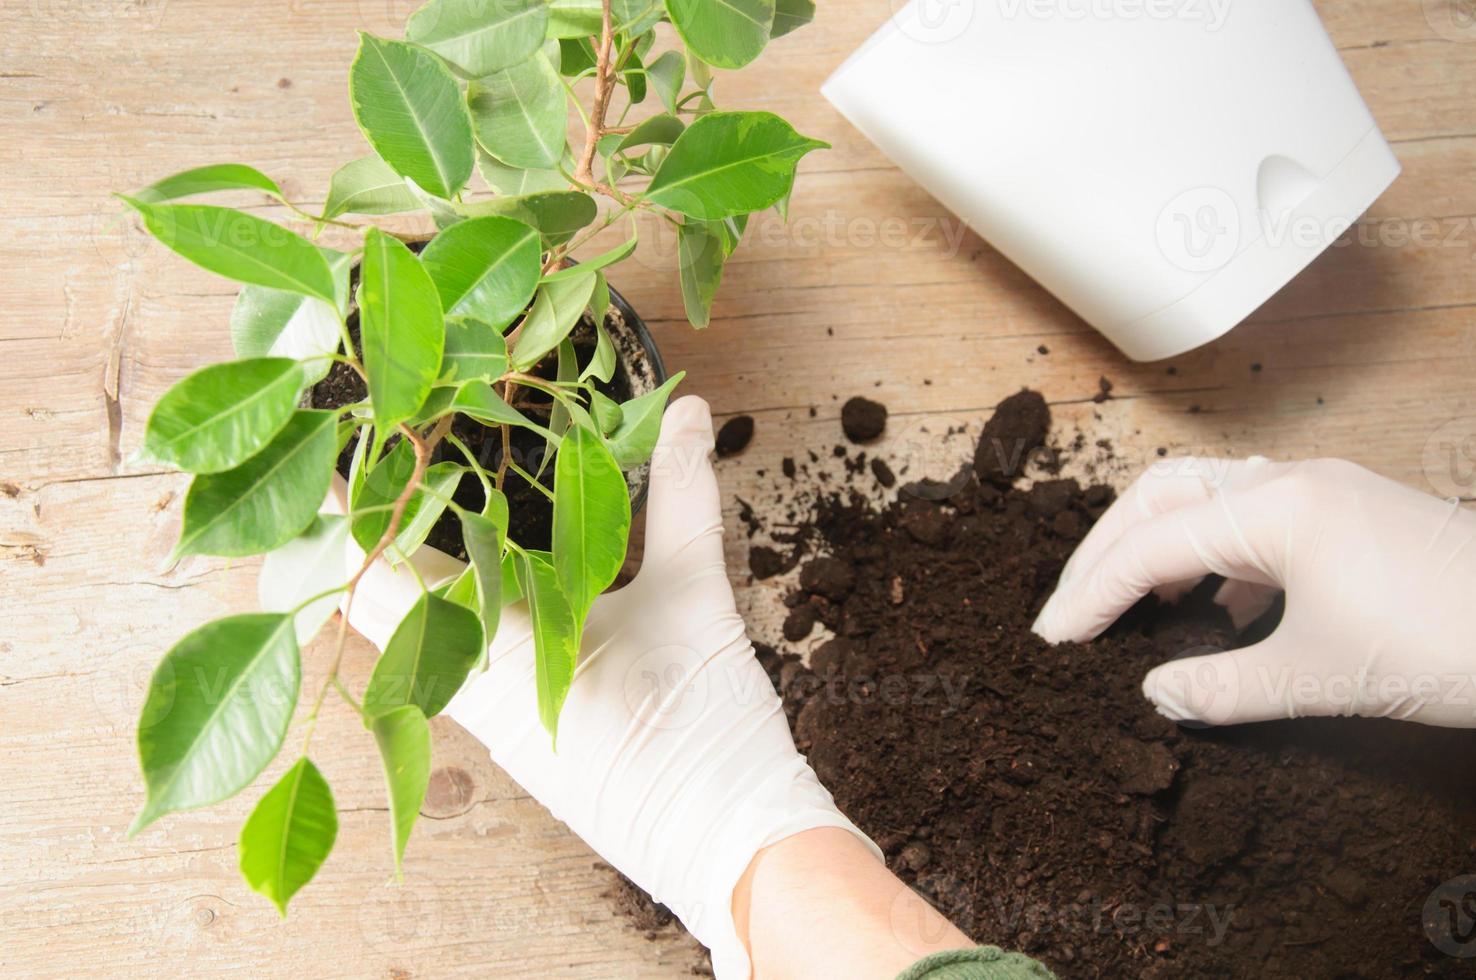 Hausgarten Umzug Zimmerpflanze foto